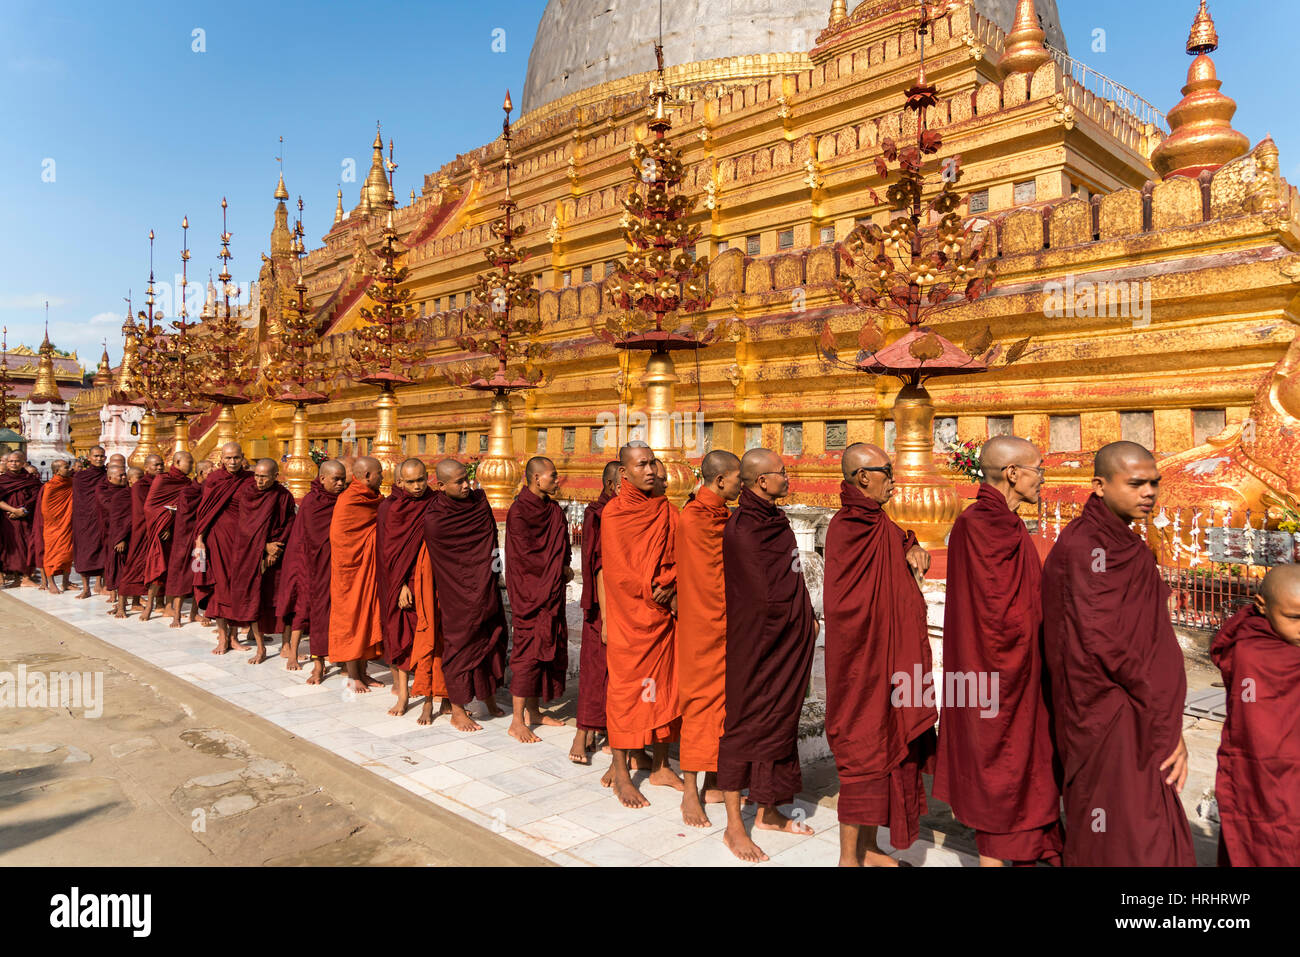 Monks at the Shwezigon Pagoda, Bagan (Pagan), Myanmar (Burma), Asia Stock Photo